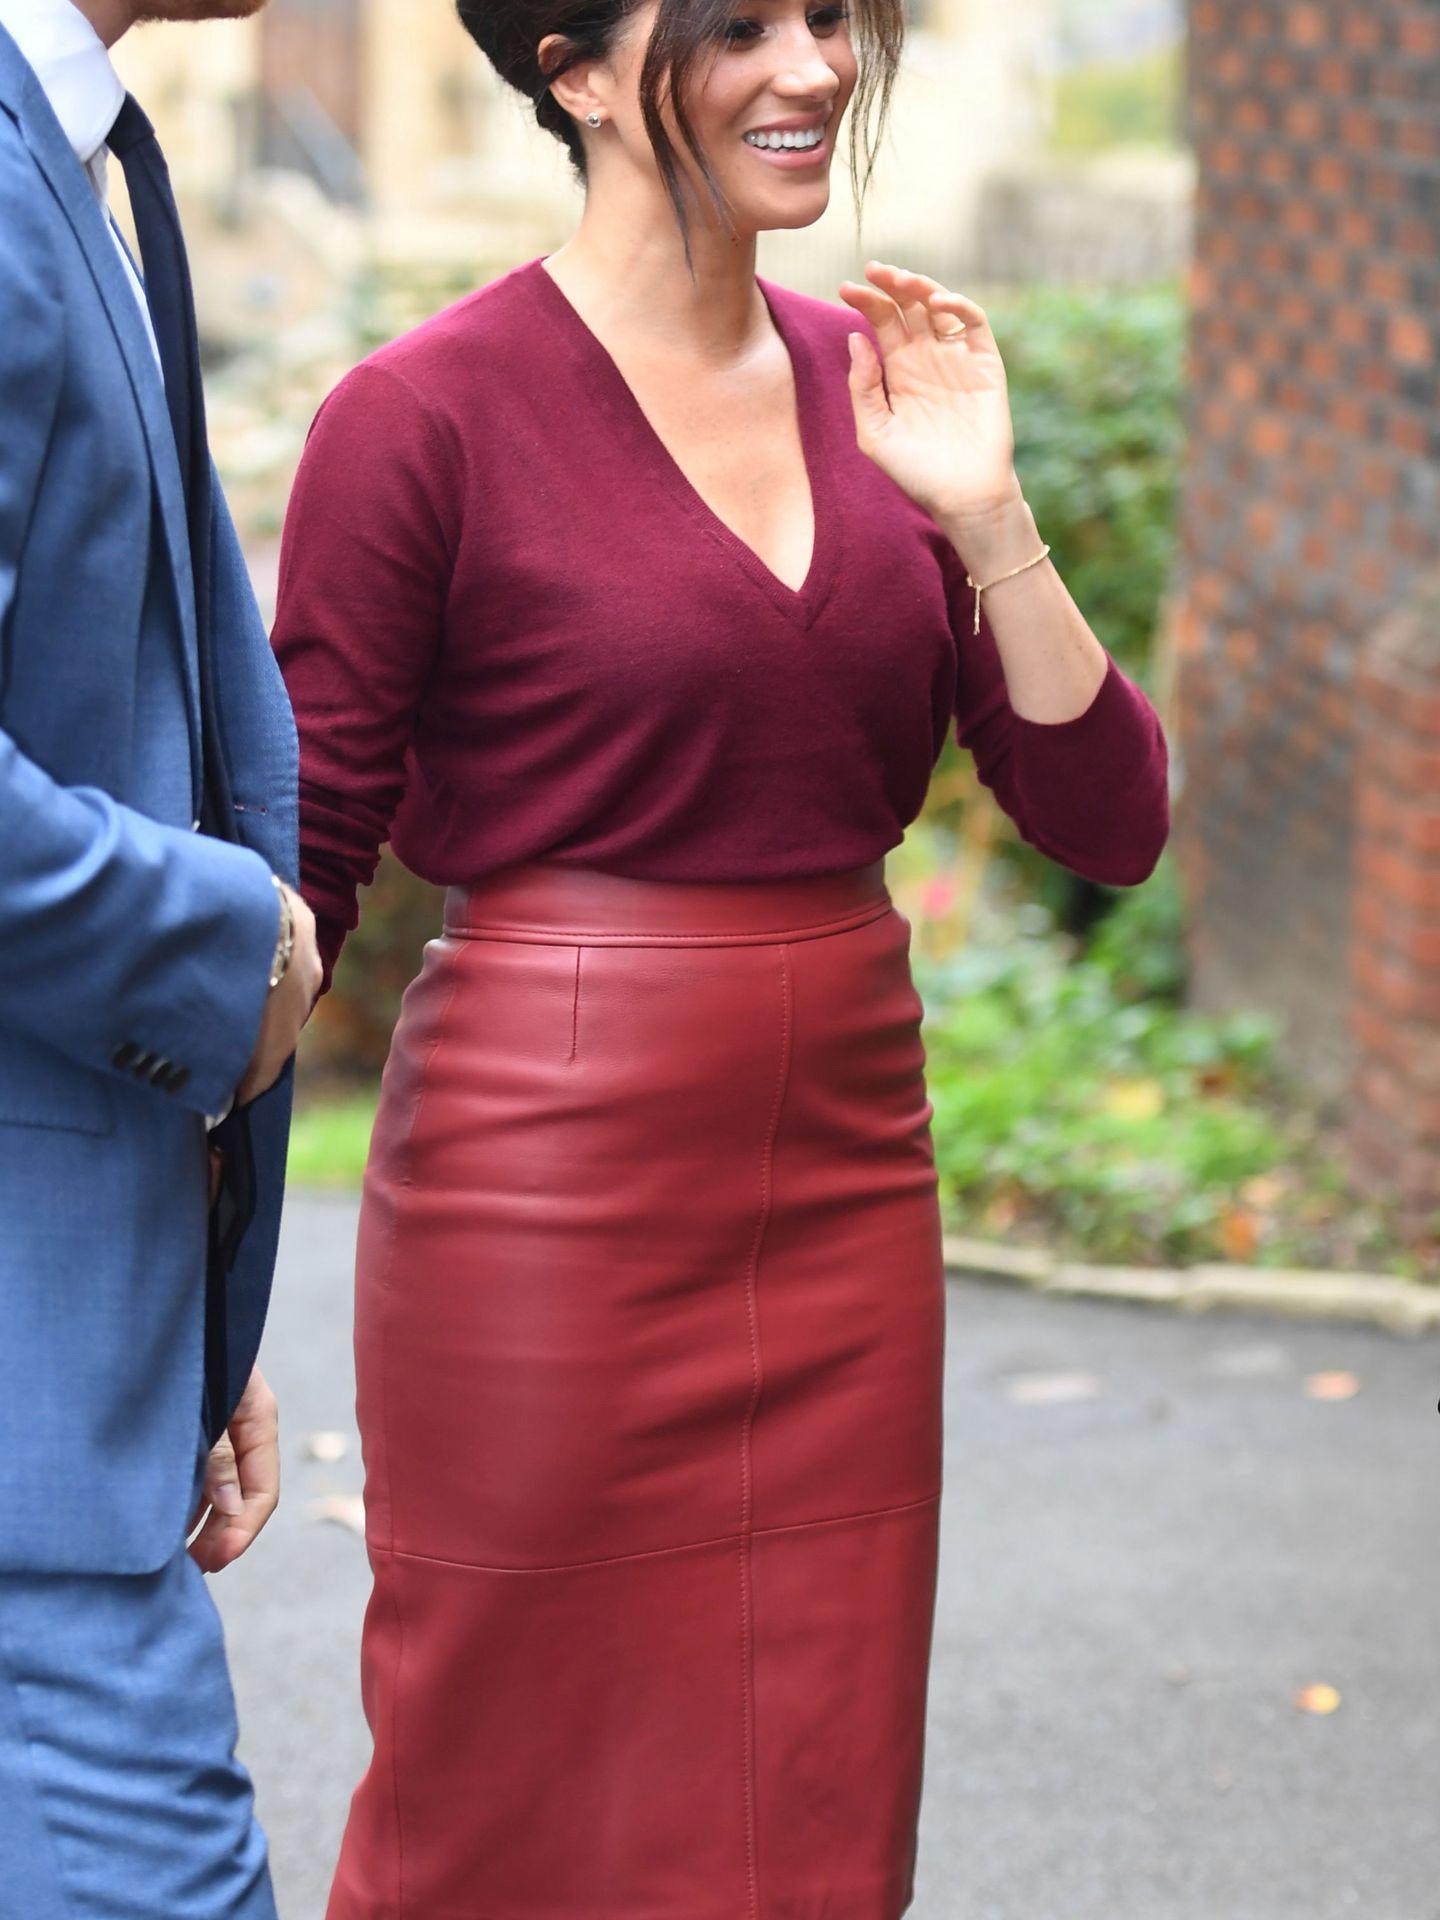 La duquesa de Sussex, el pasado octubre. (Reuters)